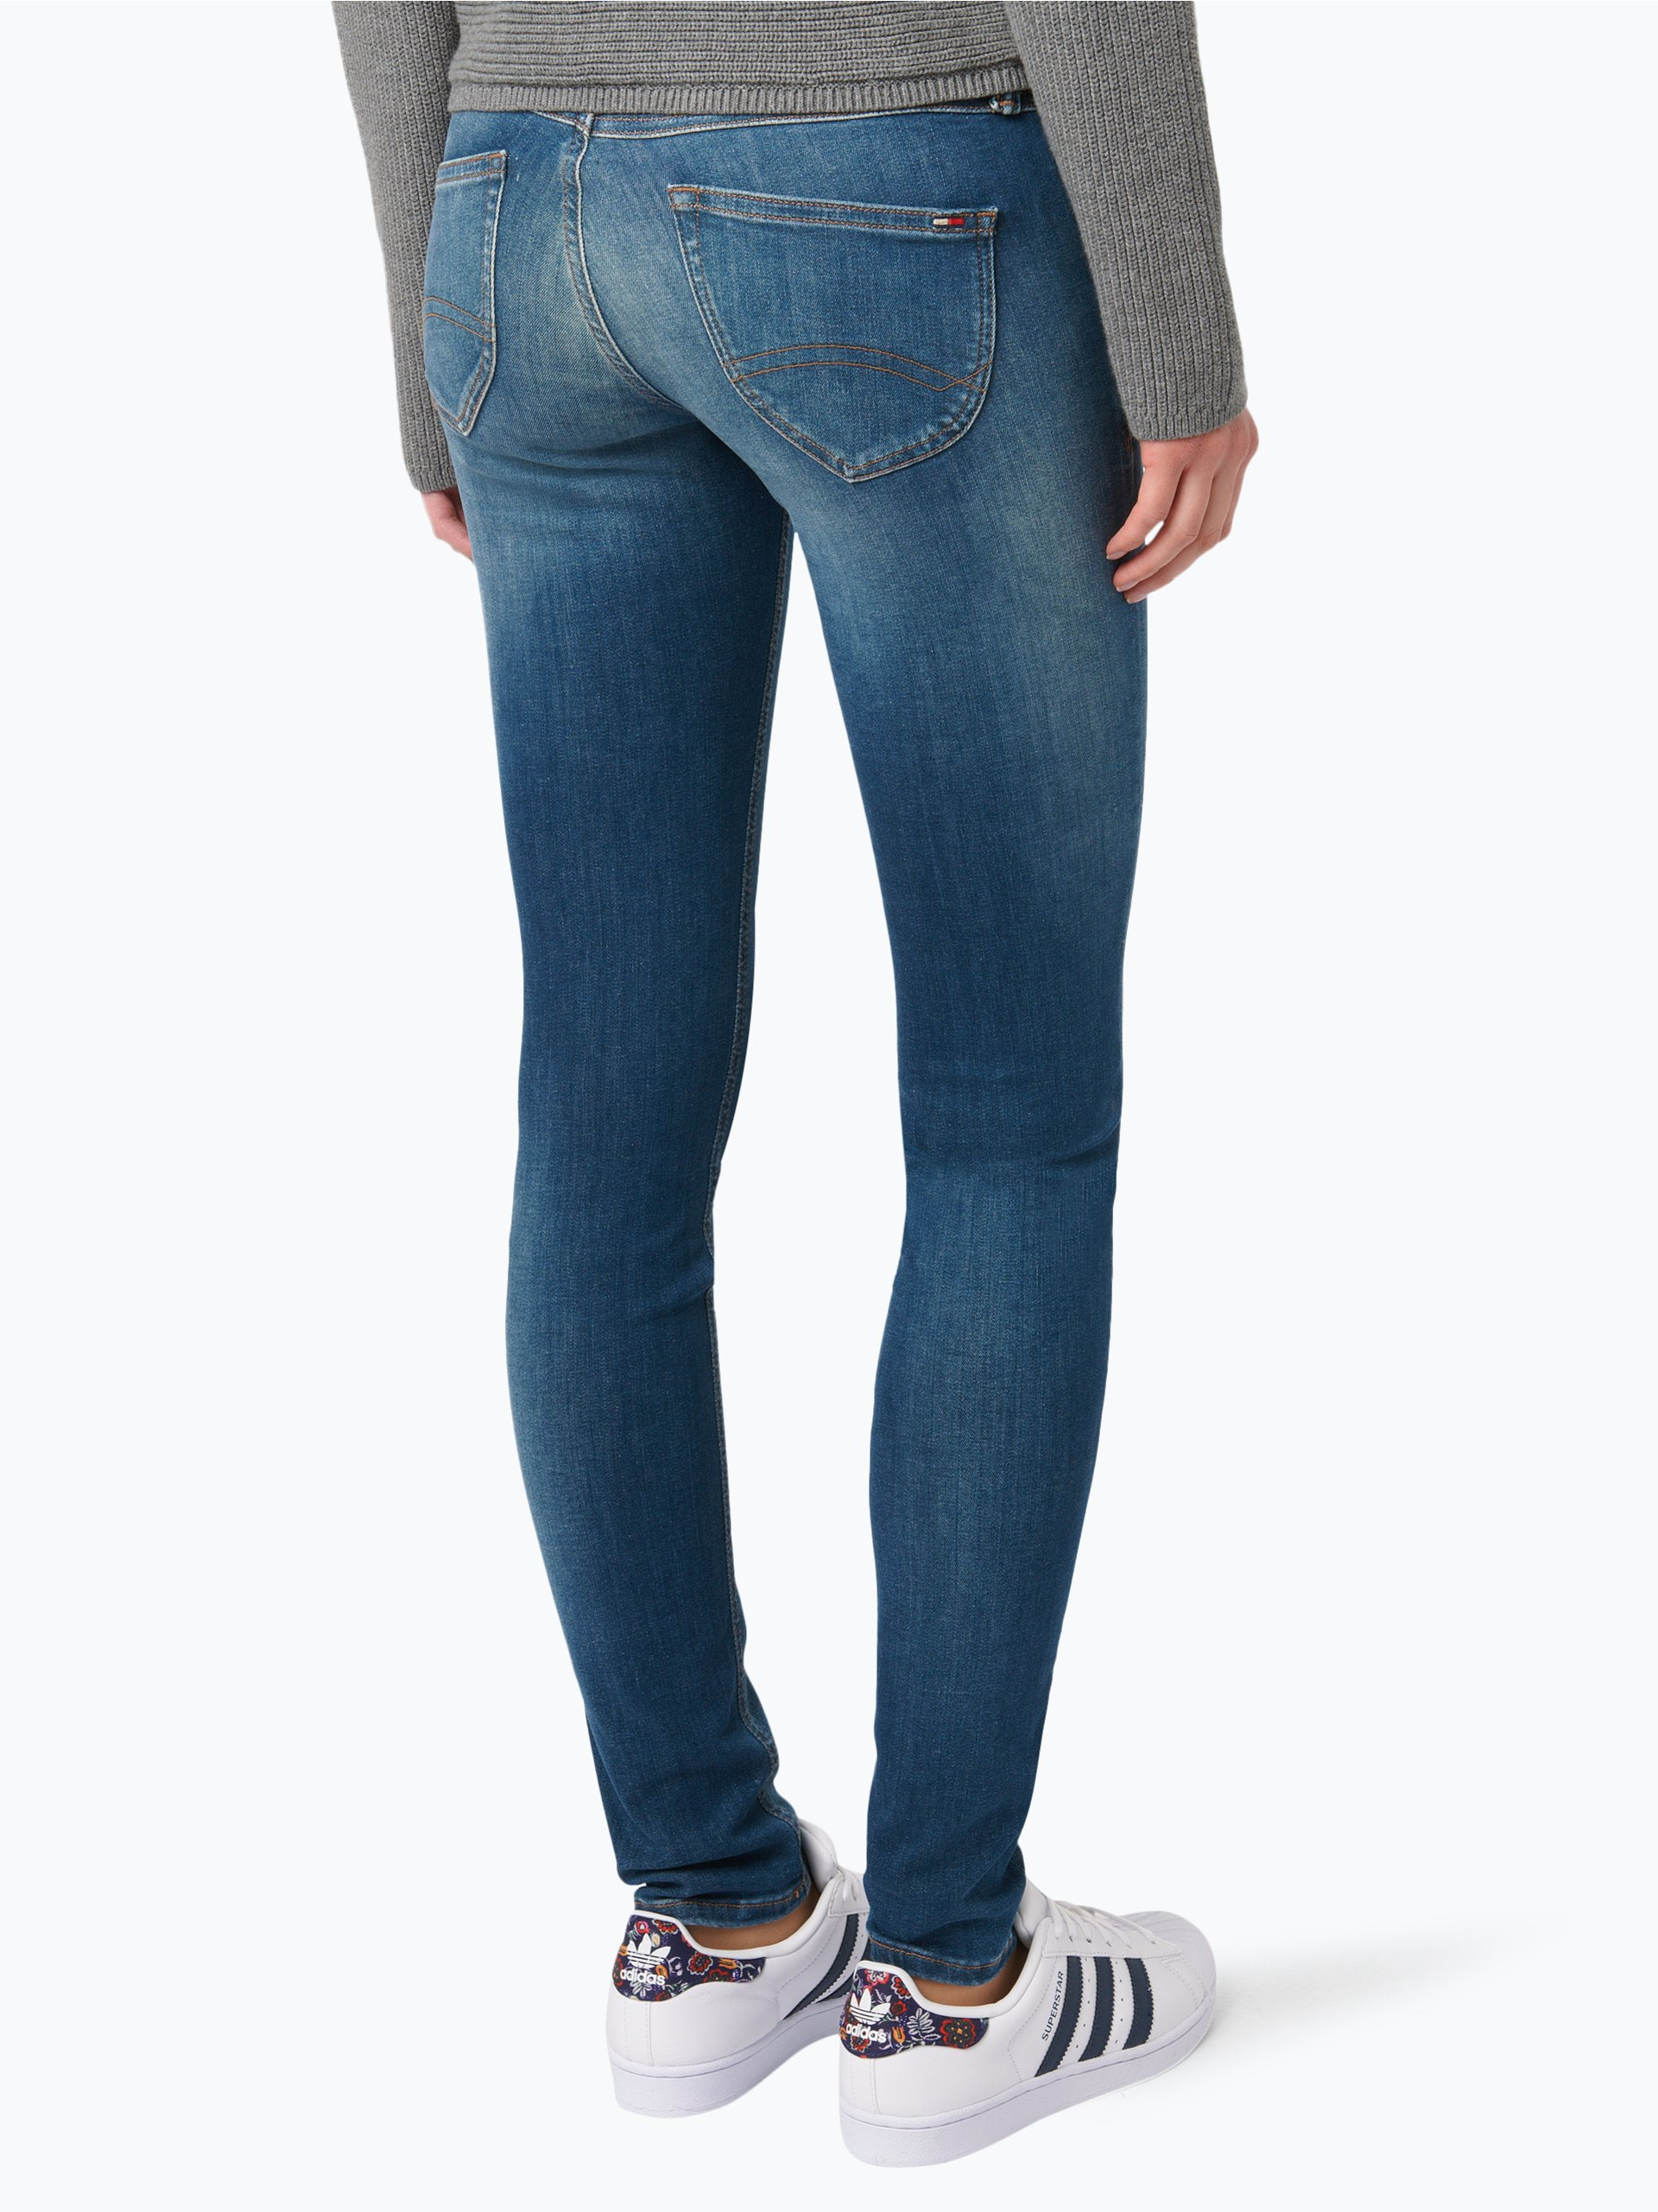 tommy jeans damen jeans sophie blau uni online kaufen. Black Bedroom Furniture Sets. Home Design Ideas